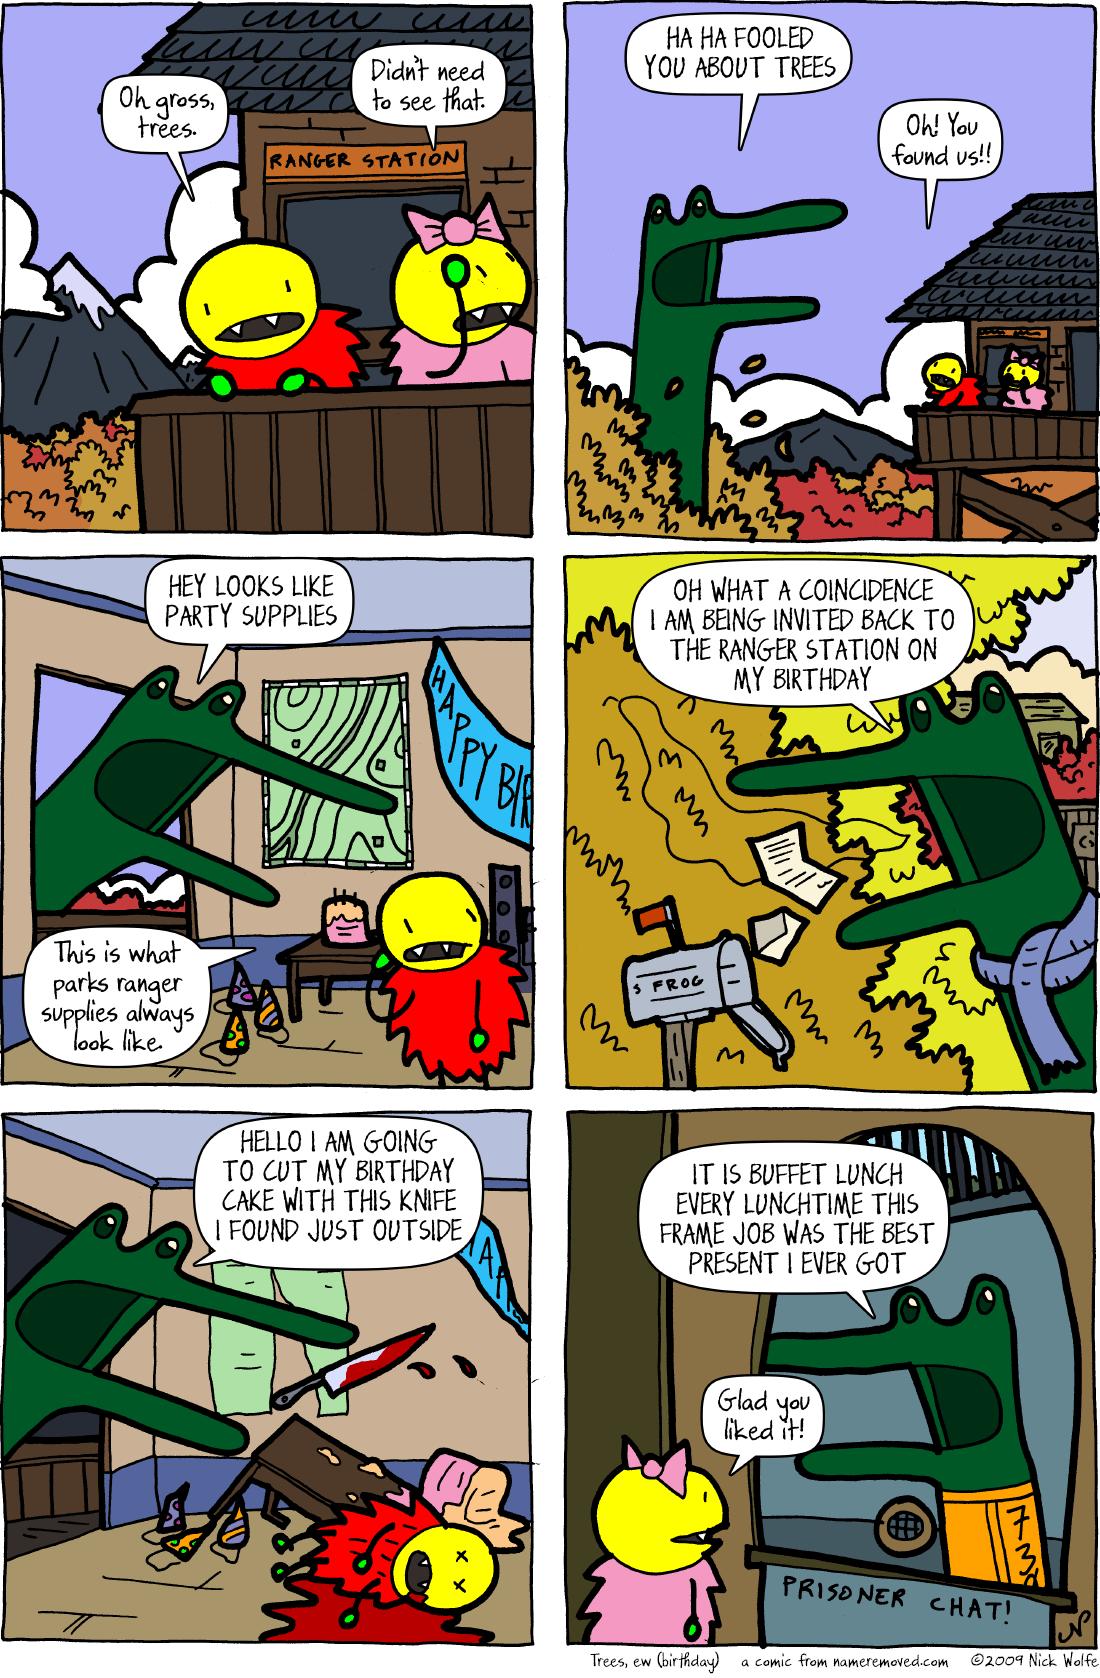 Trees, ew (birthday)